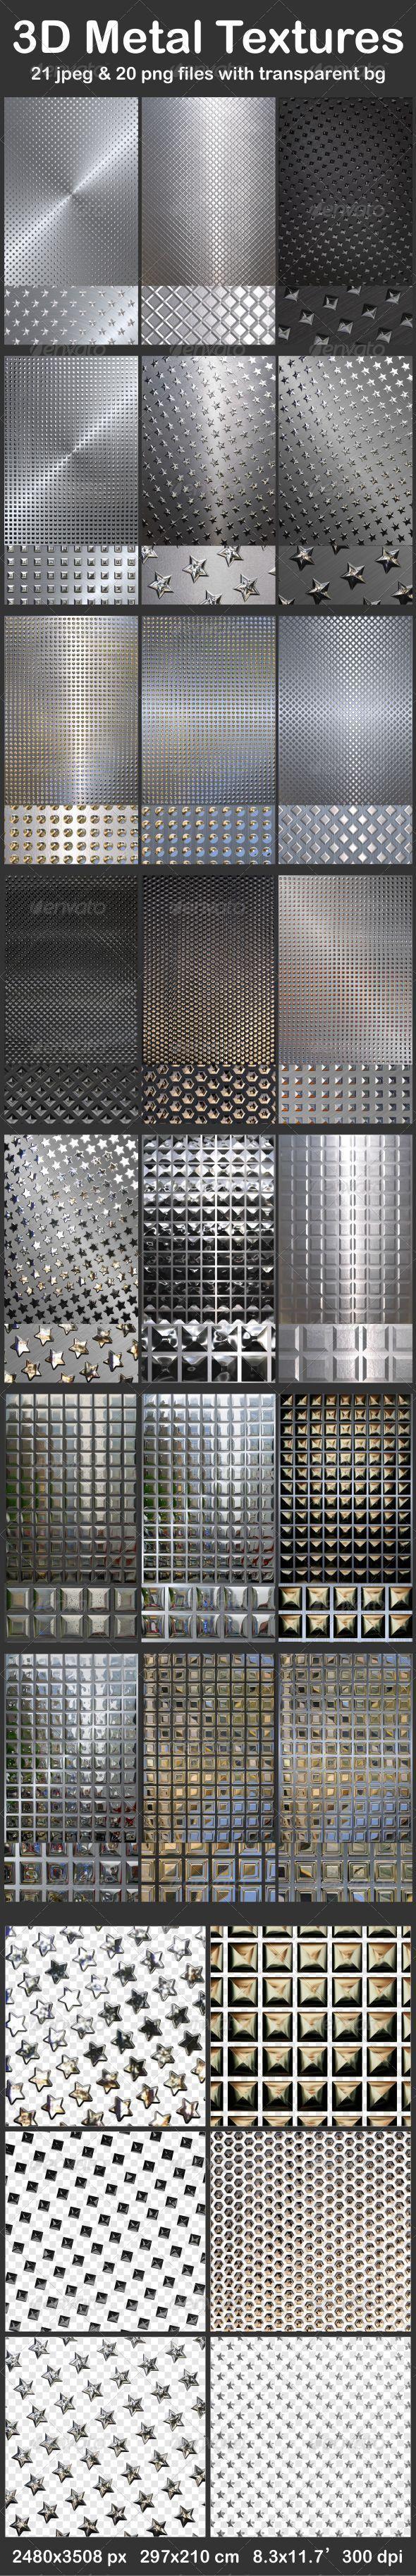 GraphicRiver 3D Metal Textures 6265518